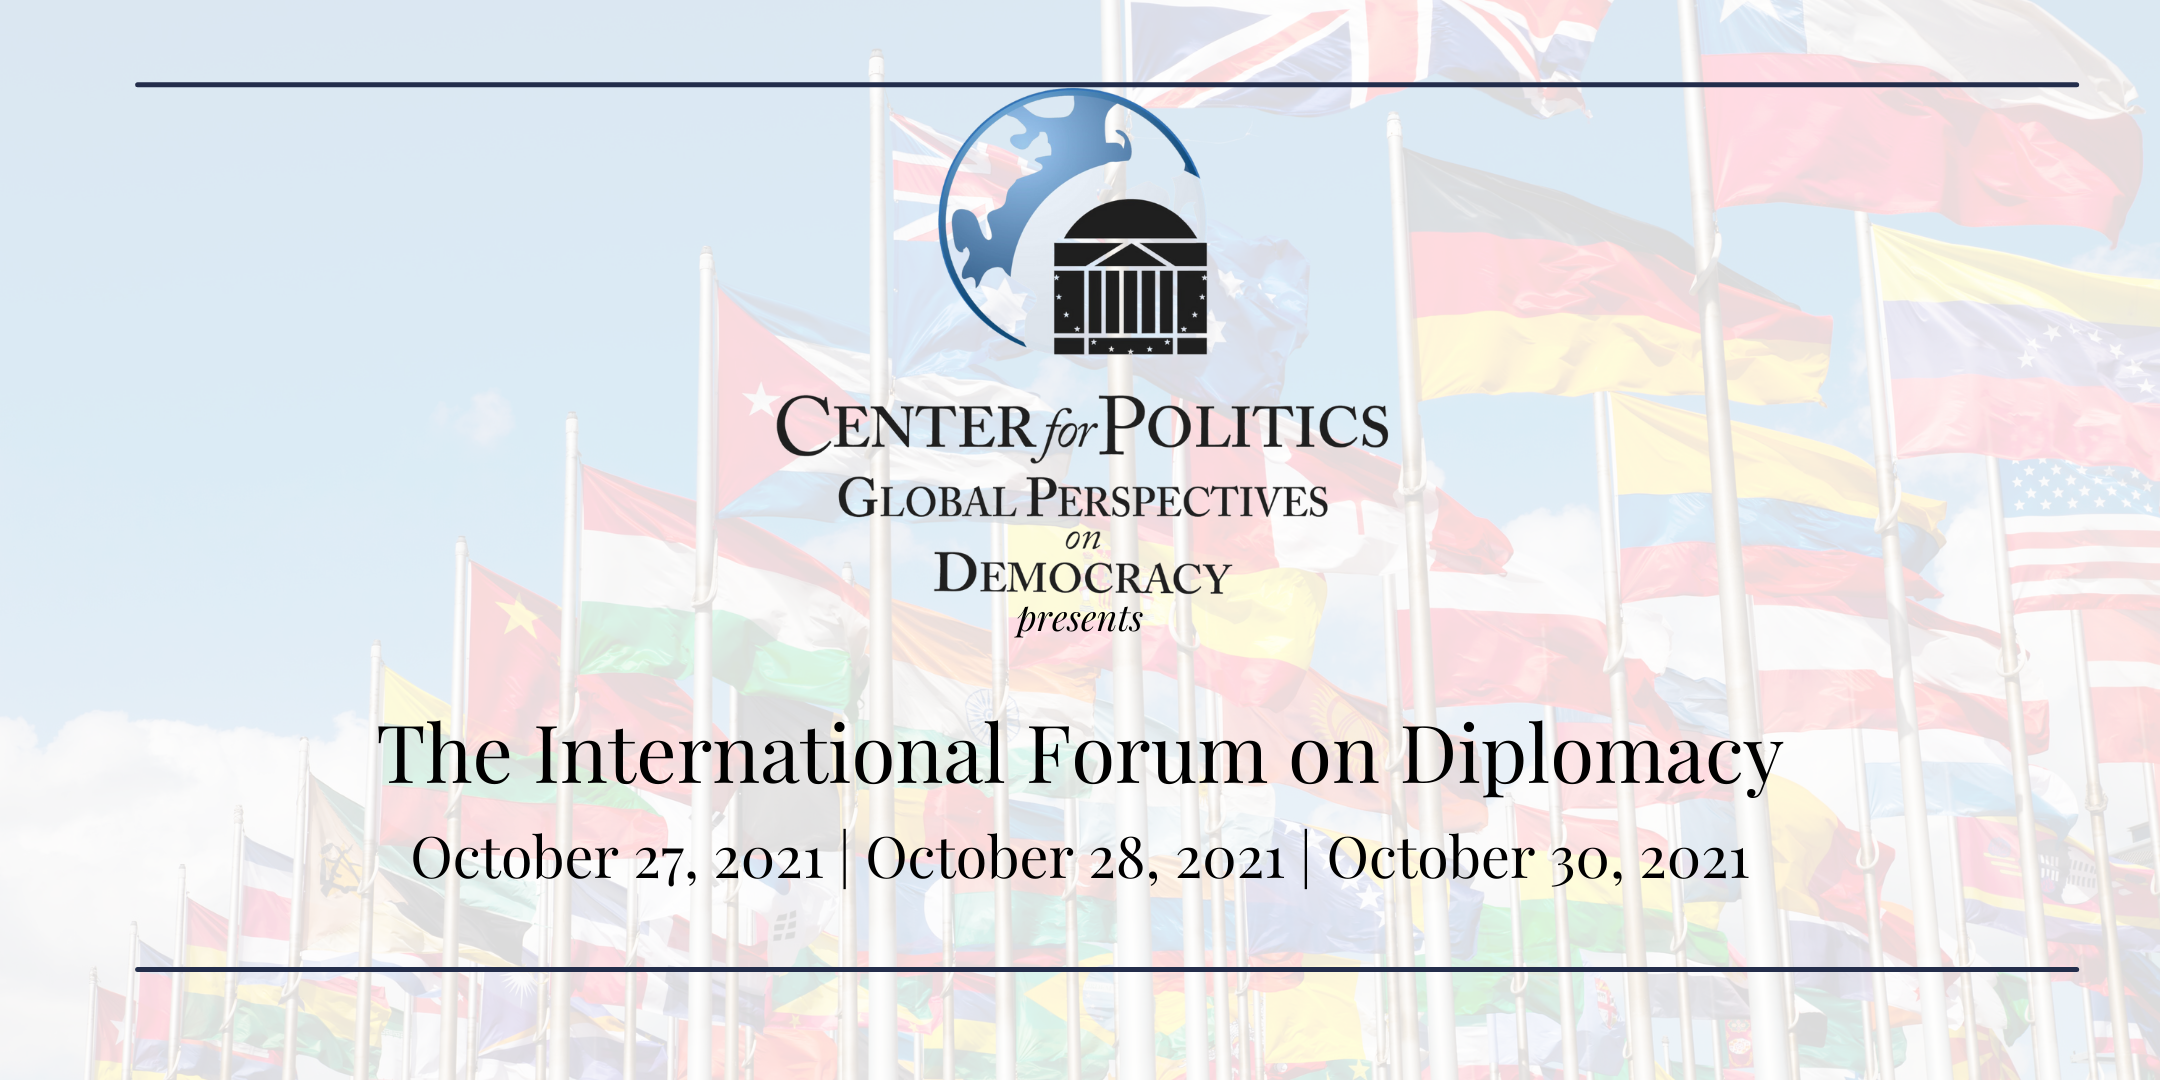 UVA Center for Politics Hosts International Forum on Diplomacy